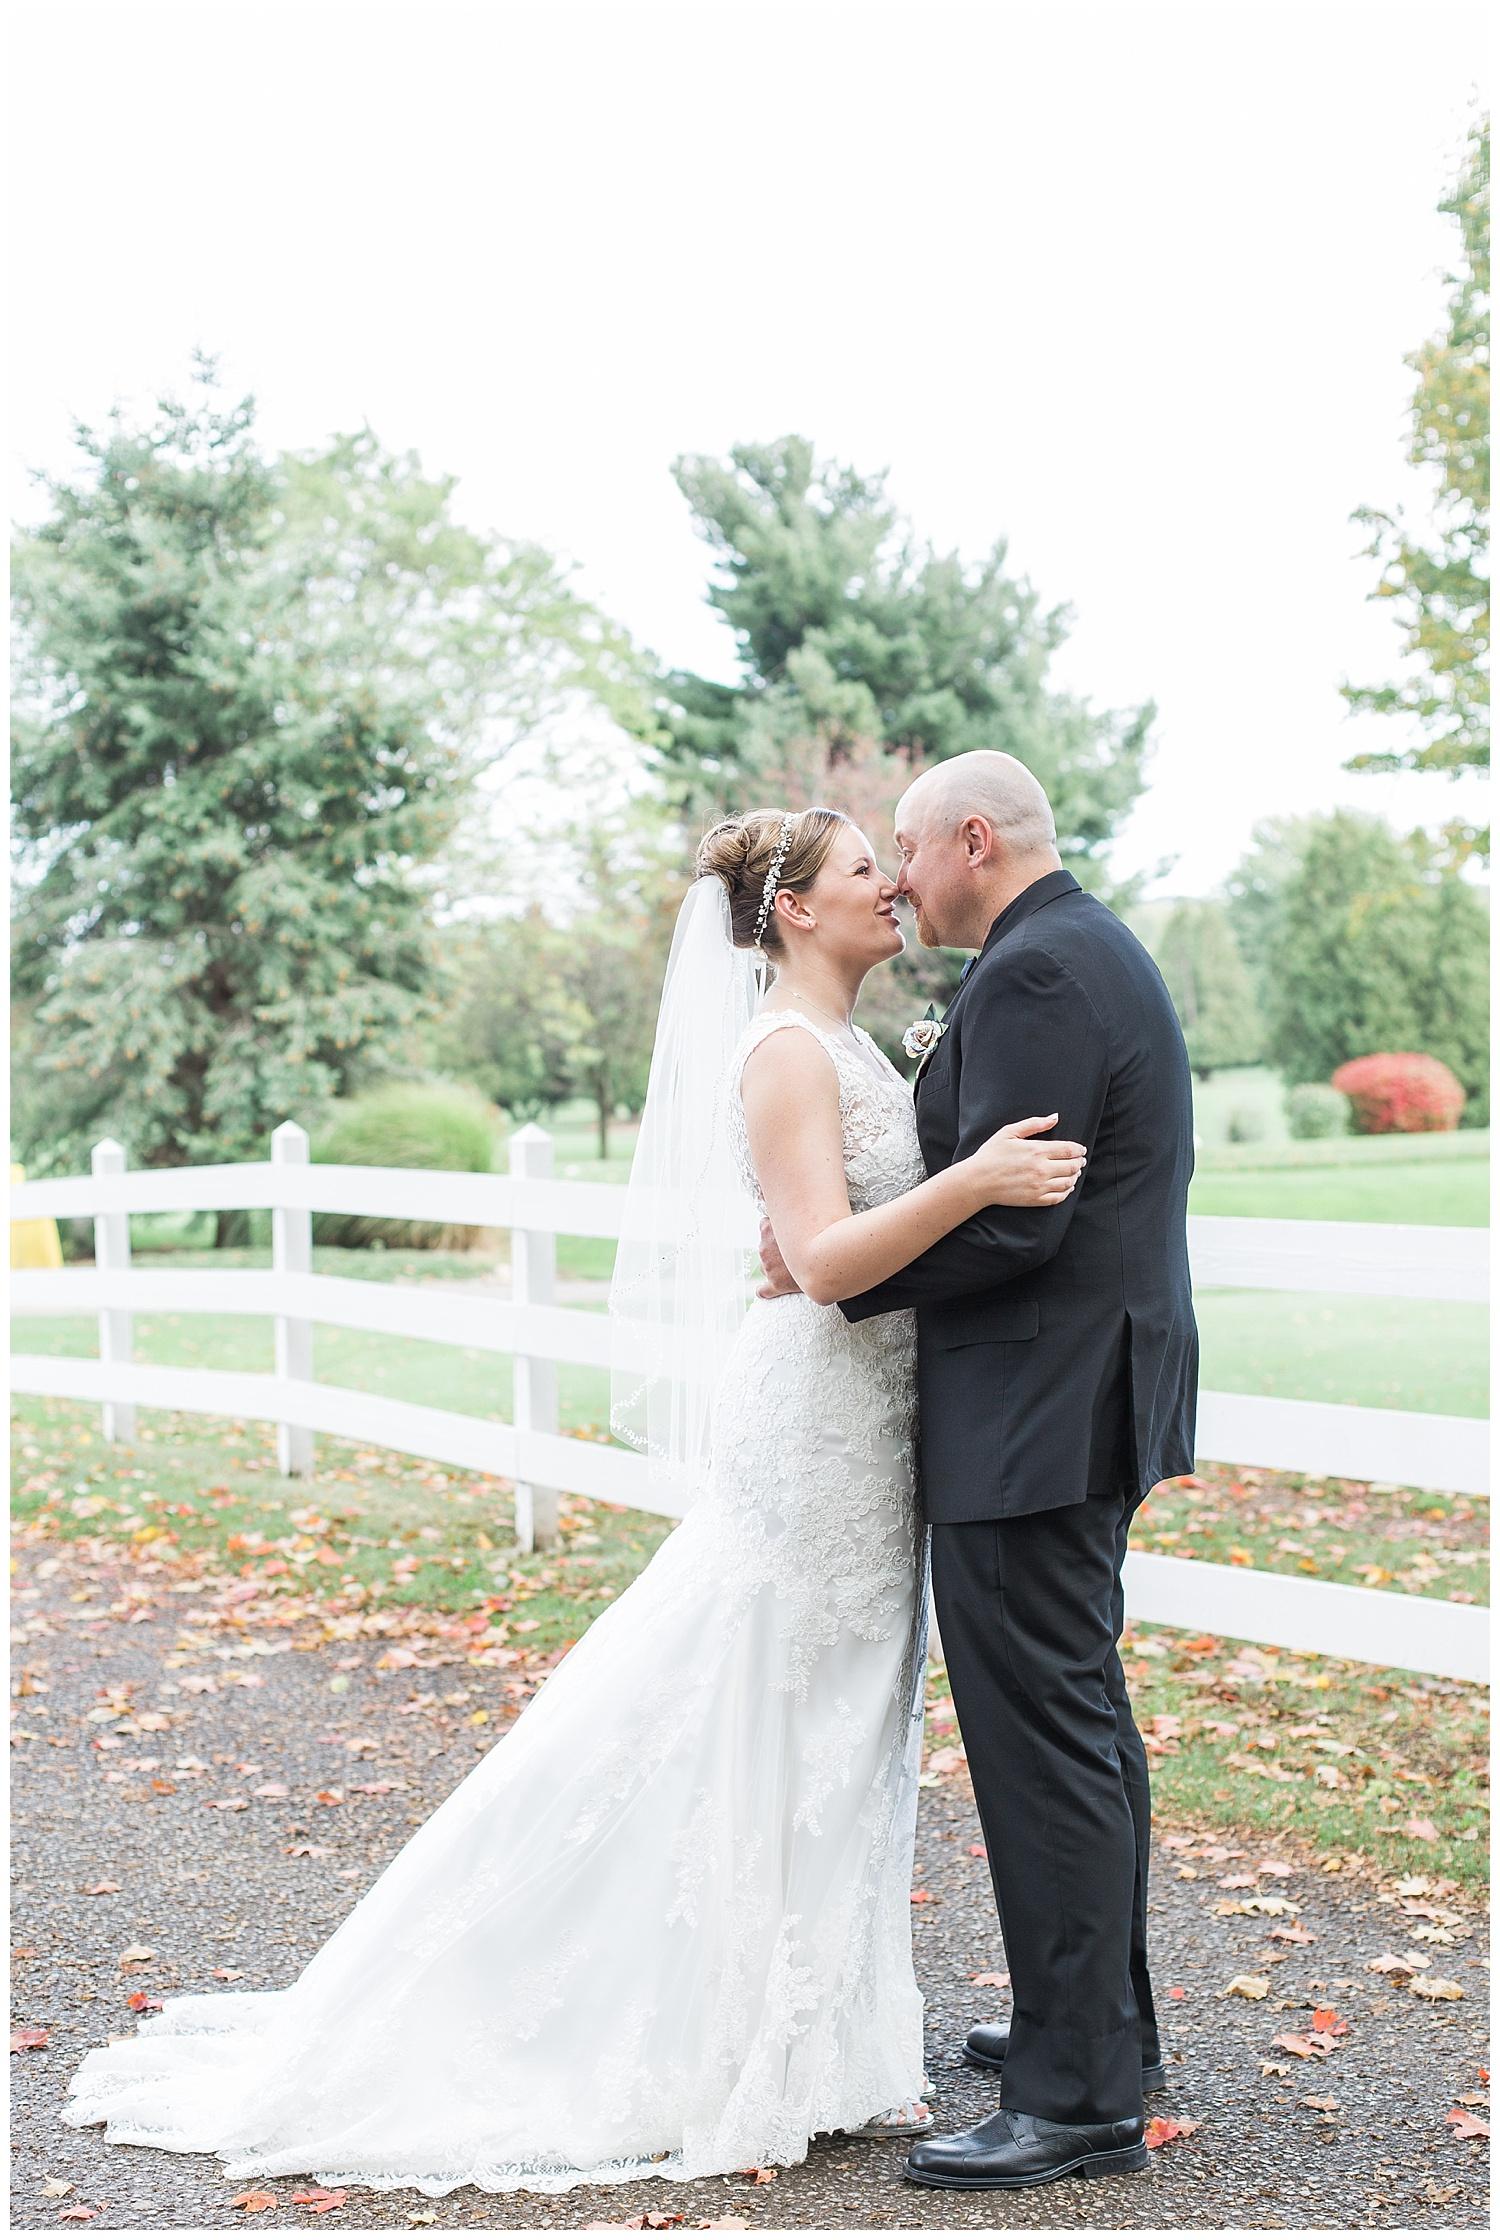 Jessica and Scott McKay - Terry Hills Golf Course - Batavia NY - Lass and Beau-22_Buffalo wedding photography.jpg